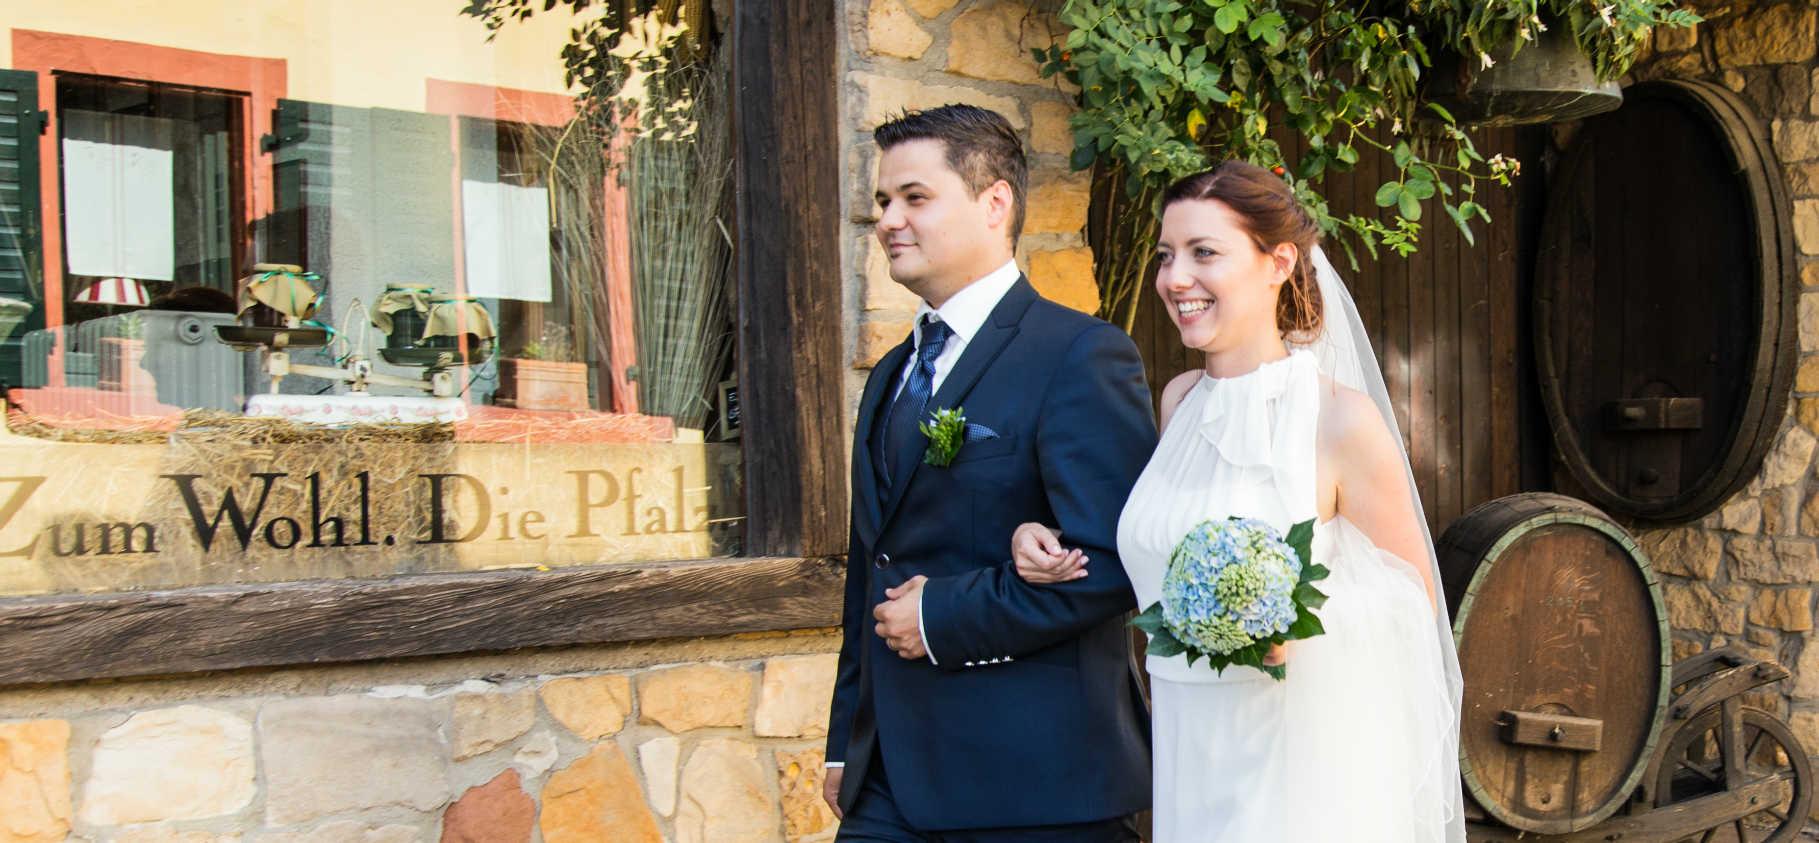 Heiraten in Ruppertsberg Brautpaar Pfalz